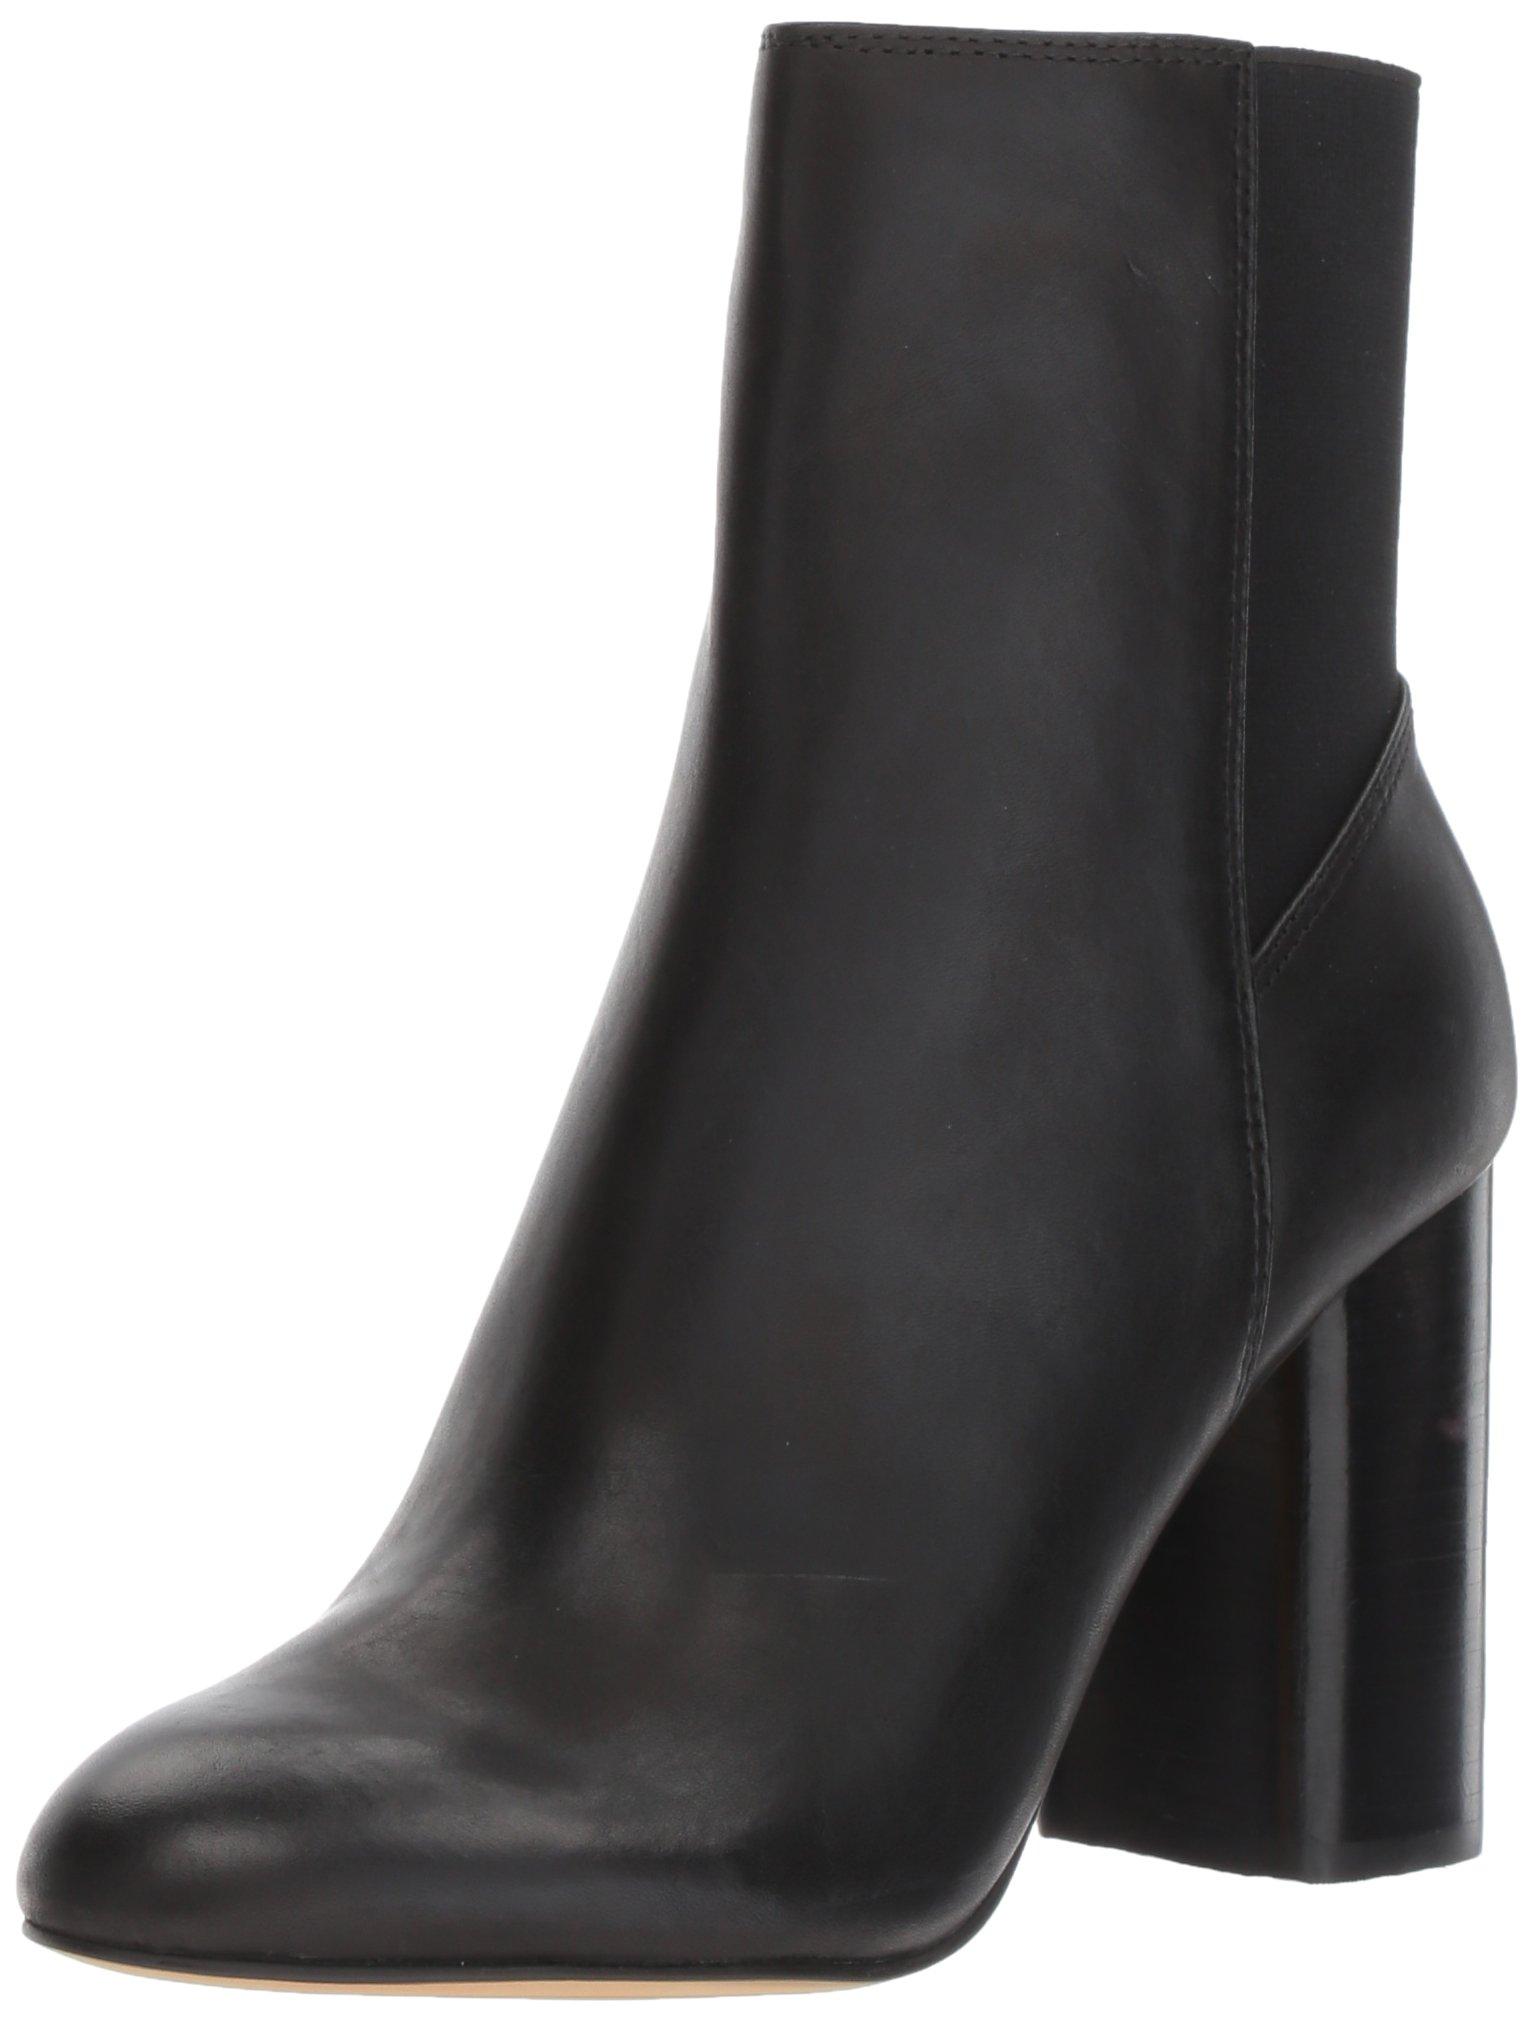 Dolce Vita Women's Ramona Fashion Boot, Black Leather, 8.5 Medium US